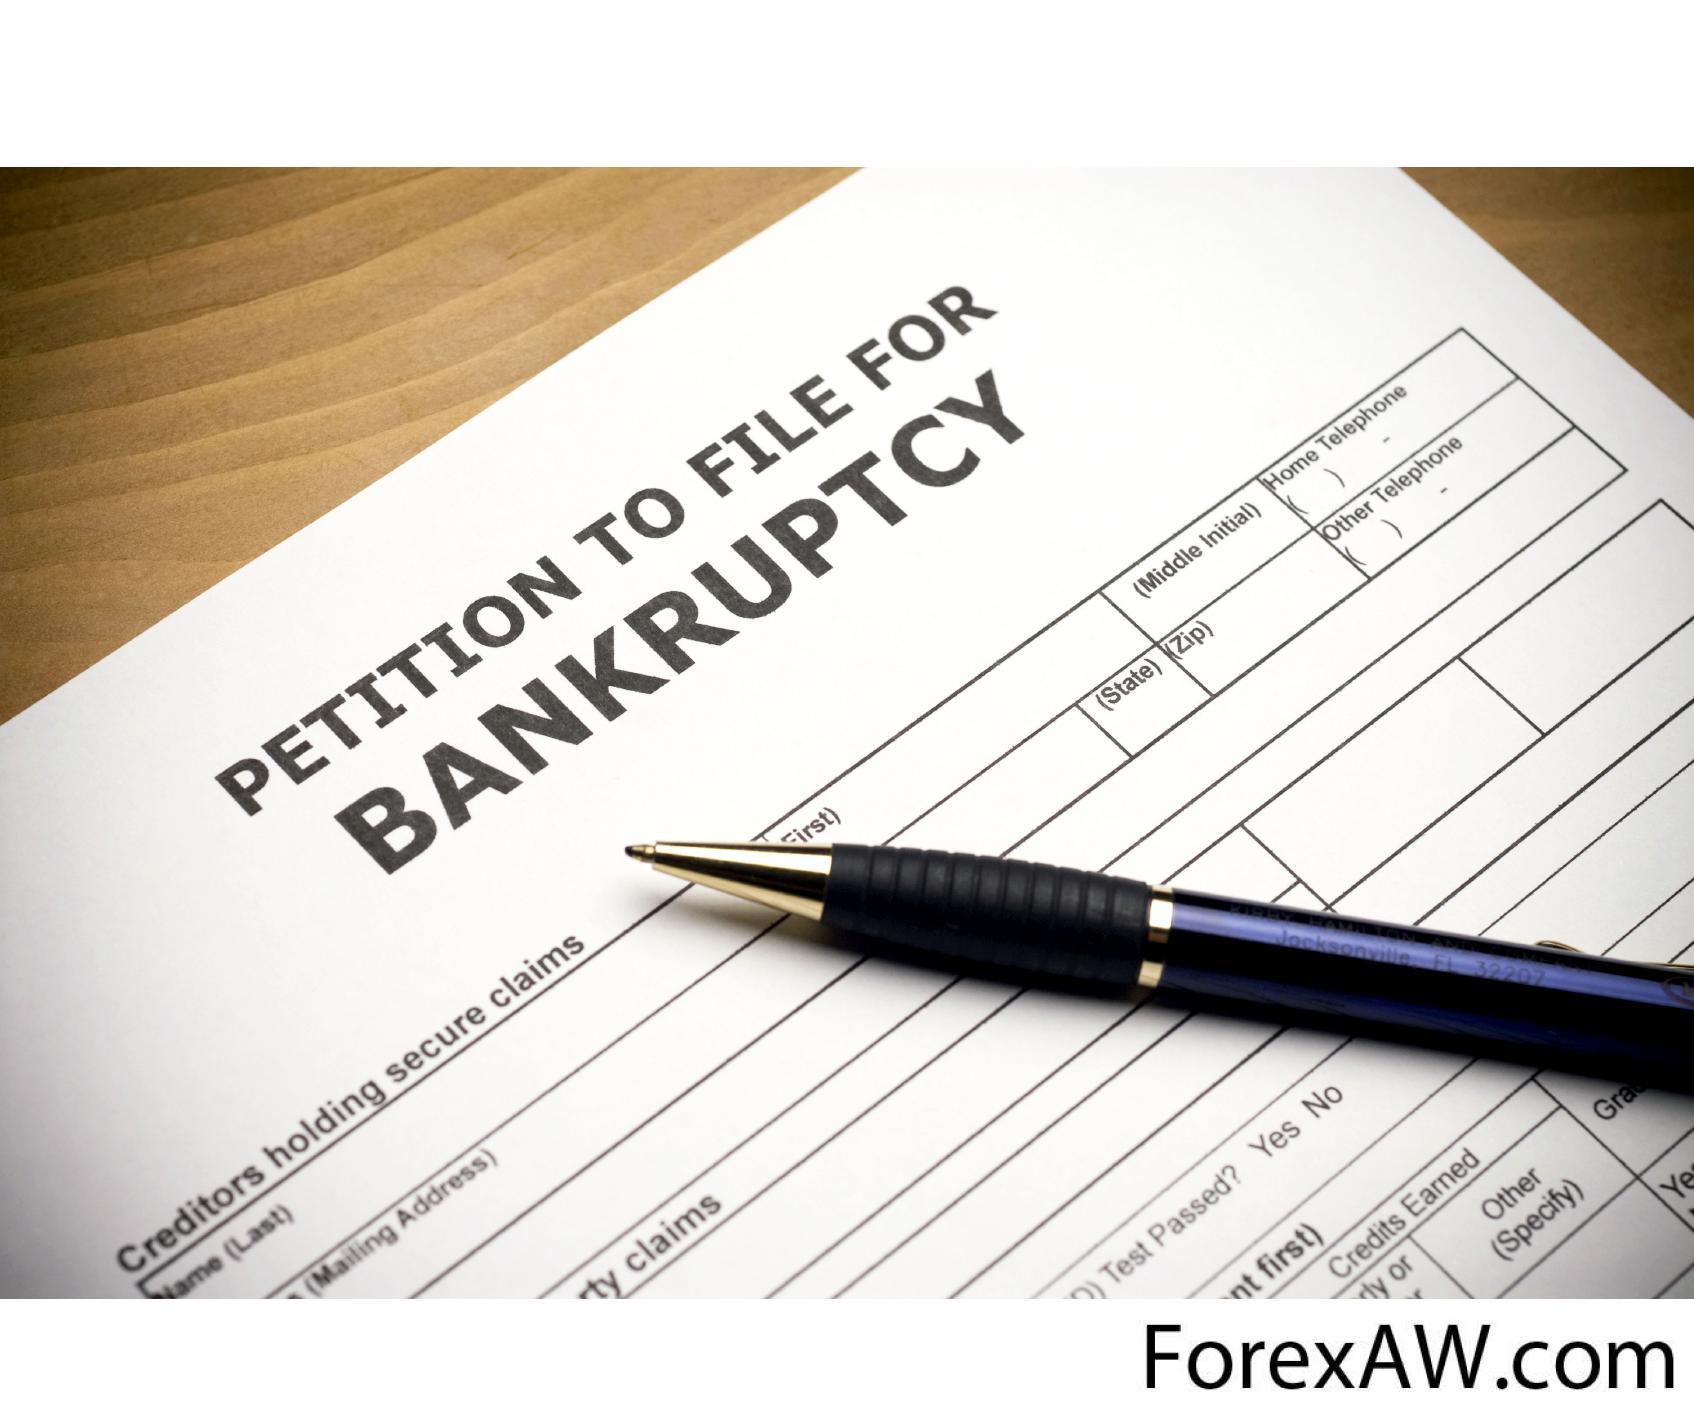 bankruptcy appellate panels affirmance - HD1694×1285